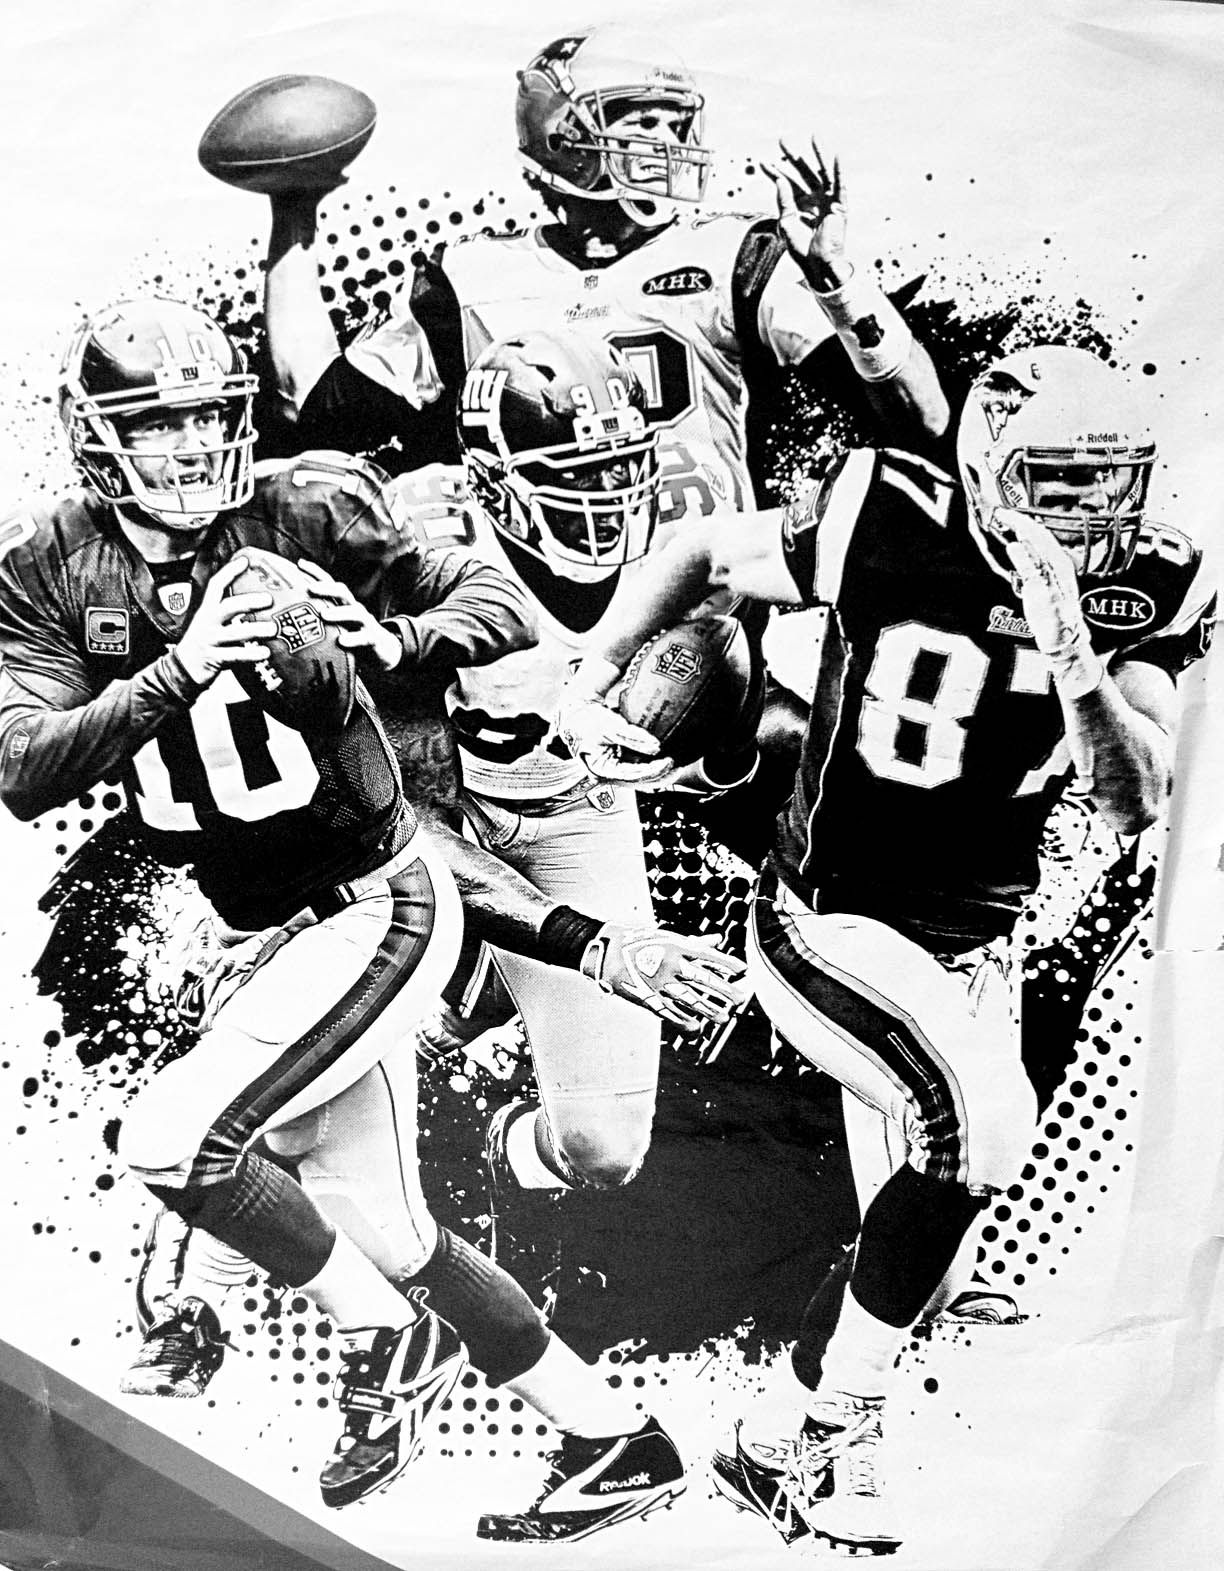 NFL composite B/W